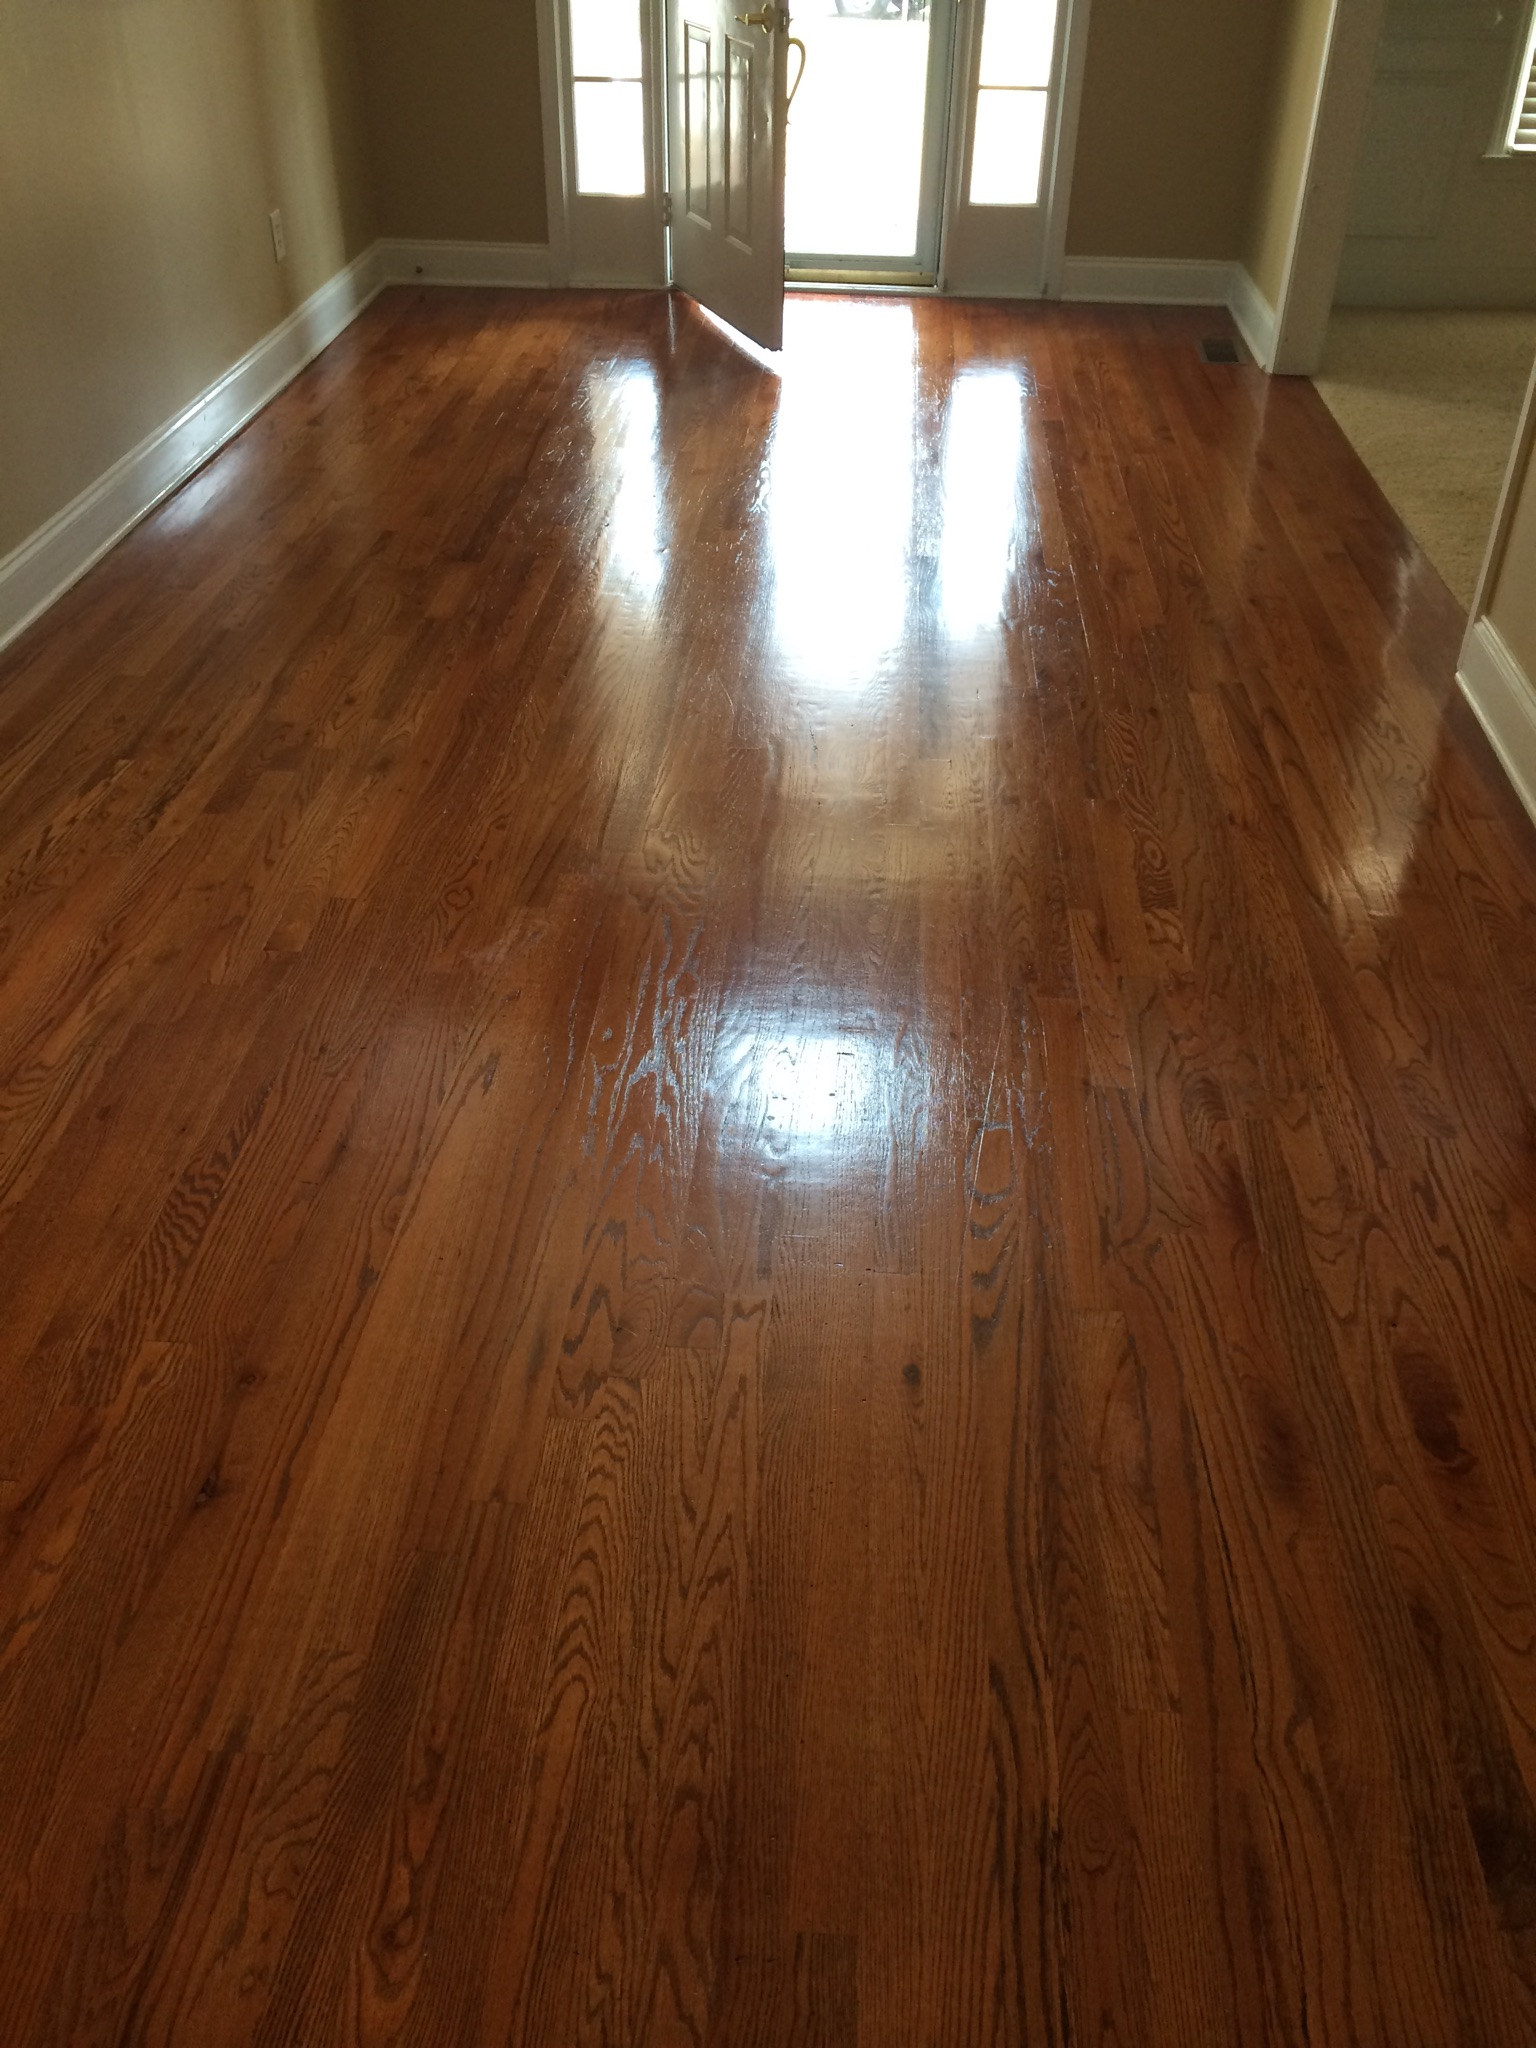 D M Carpet Cleaning - Liburn, GA